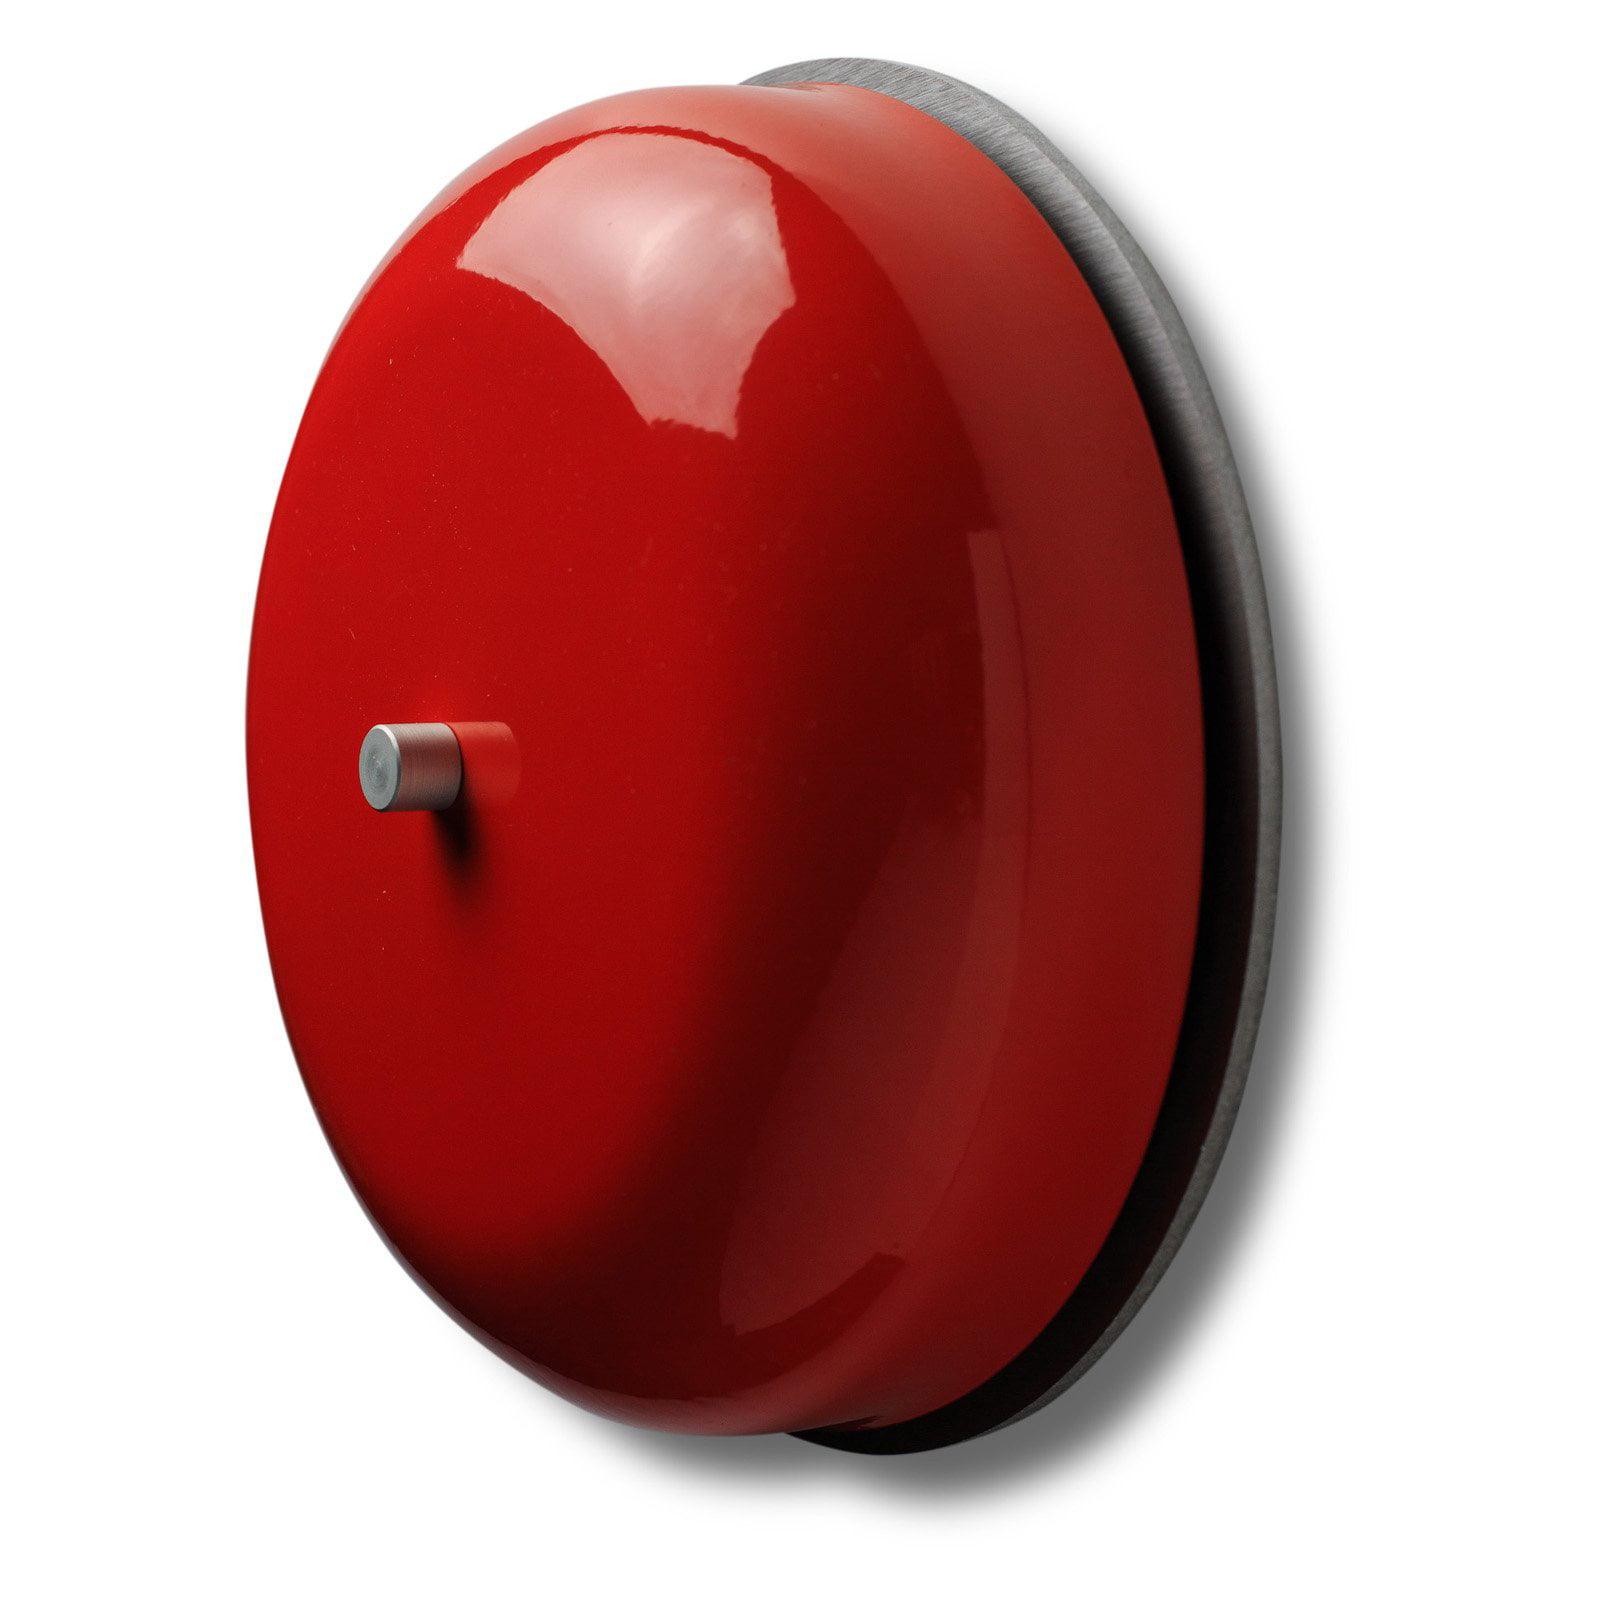 Spore Big Ring Doorbell Chime